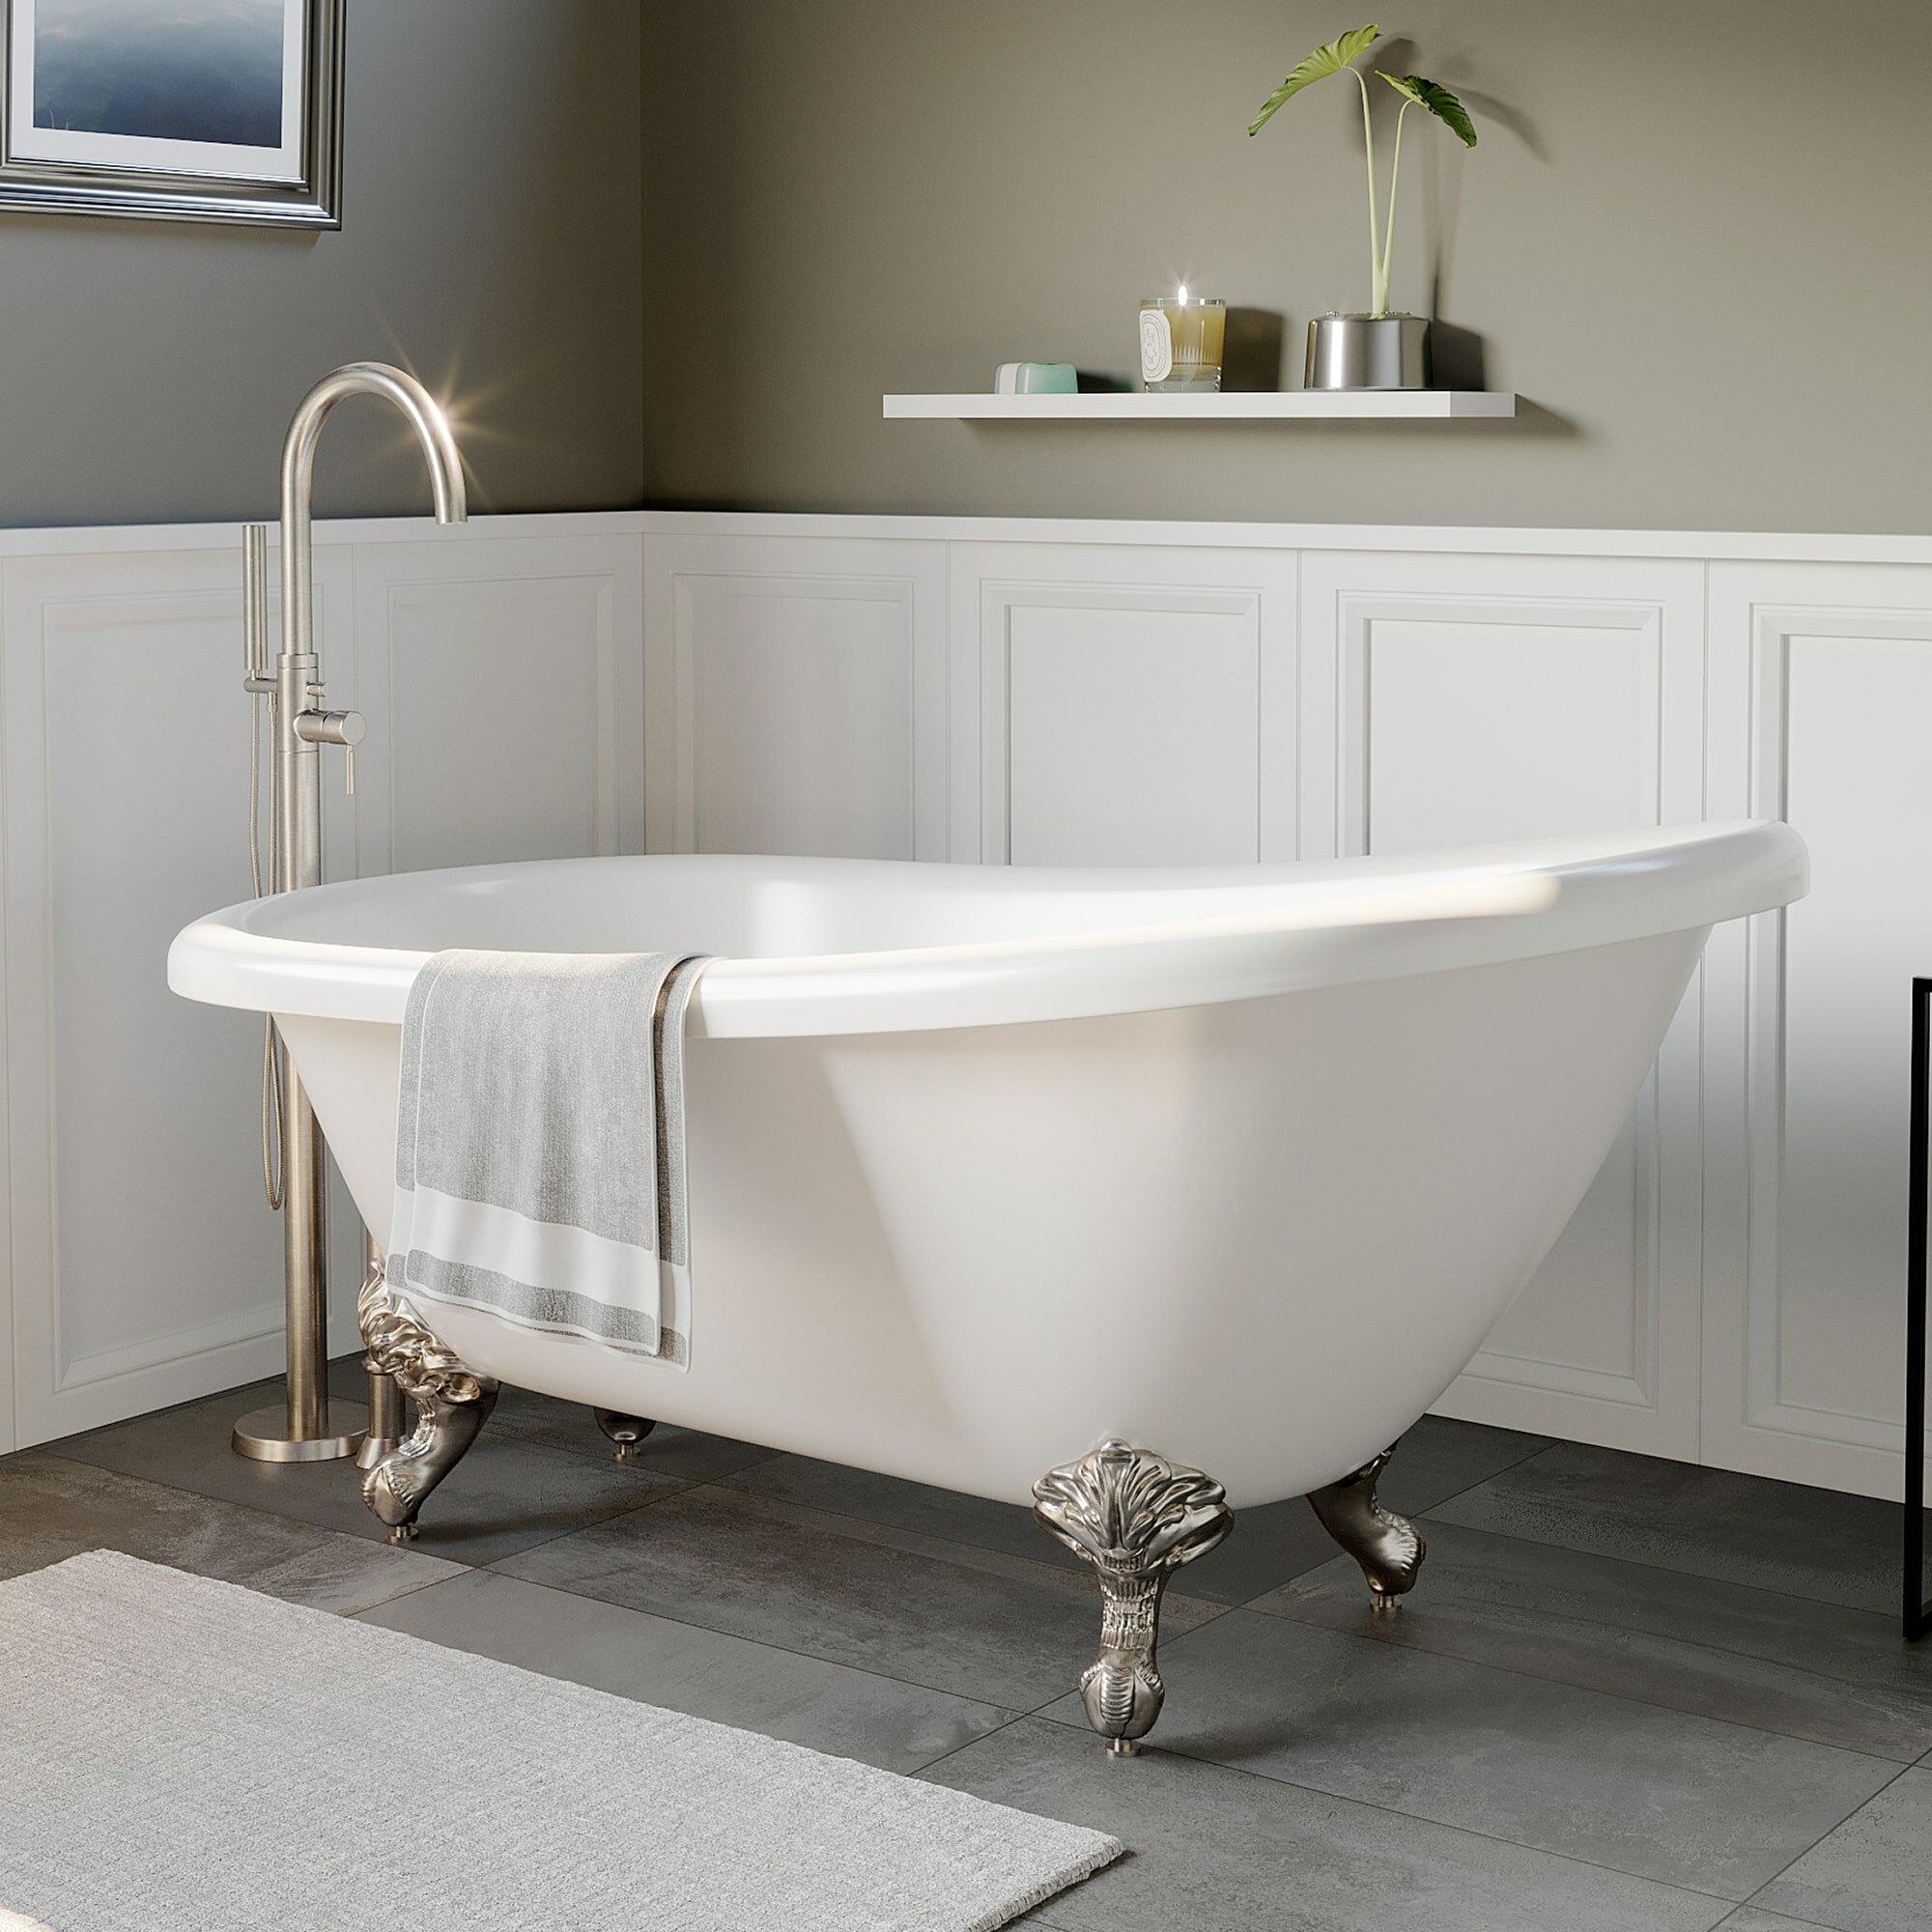 61 X 28 Clawfoot Soaking Bathtub